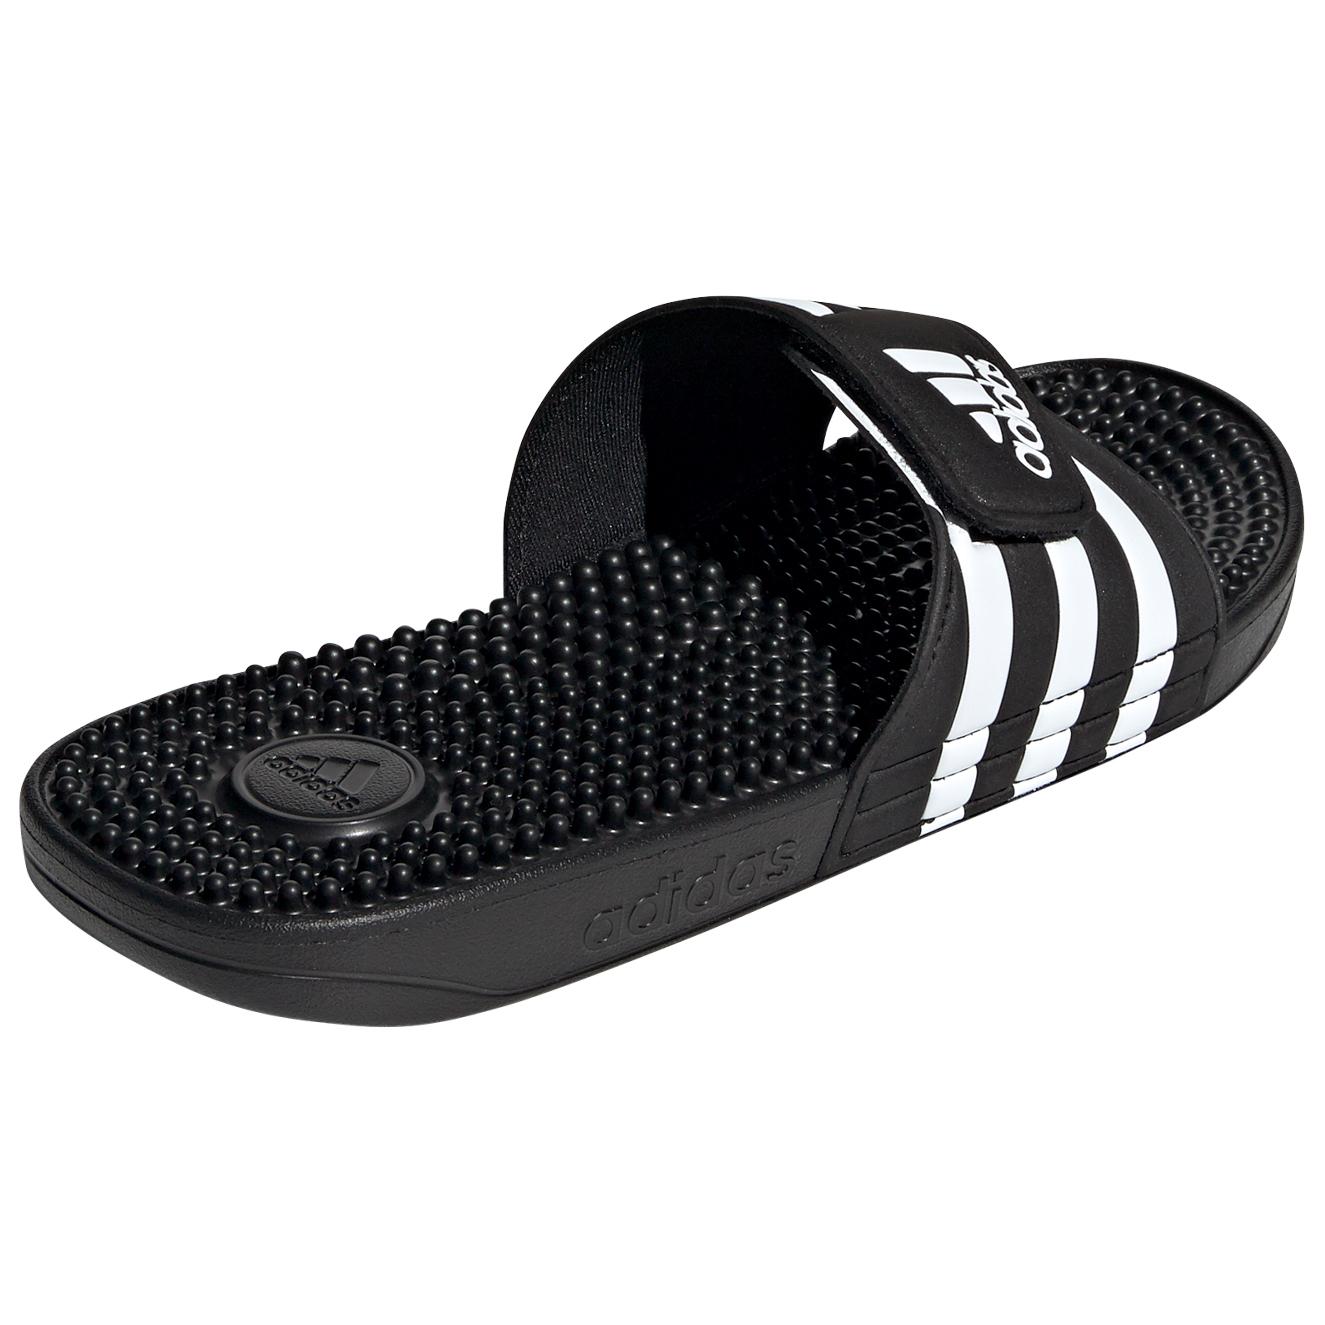 new arrival 8a4fa 971f8 ... adidas - Adissage - Sandalen ...